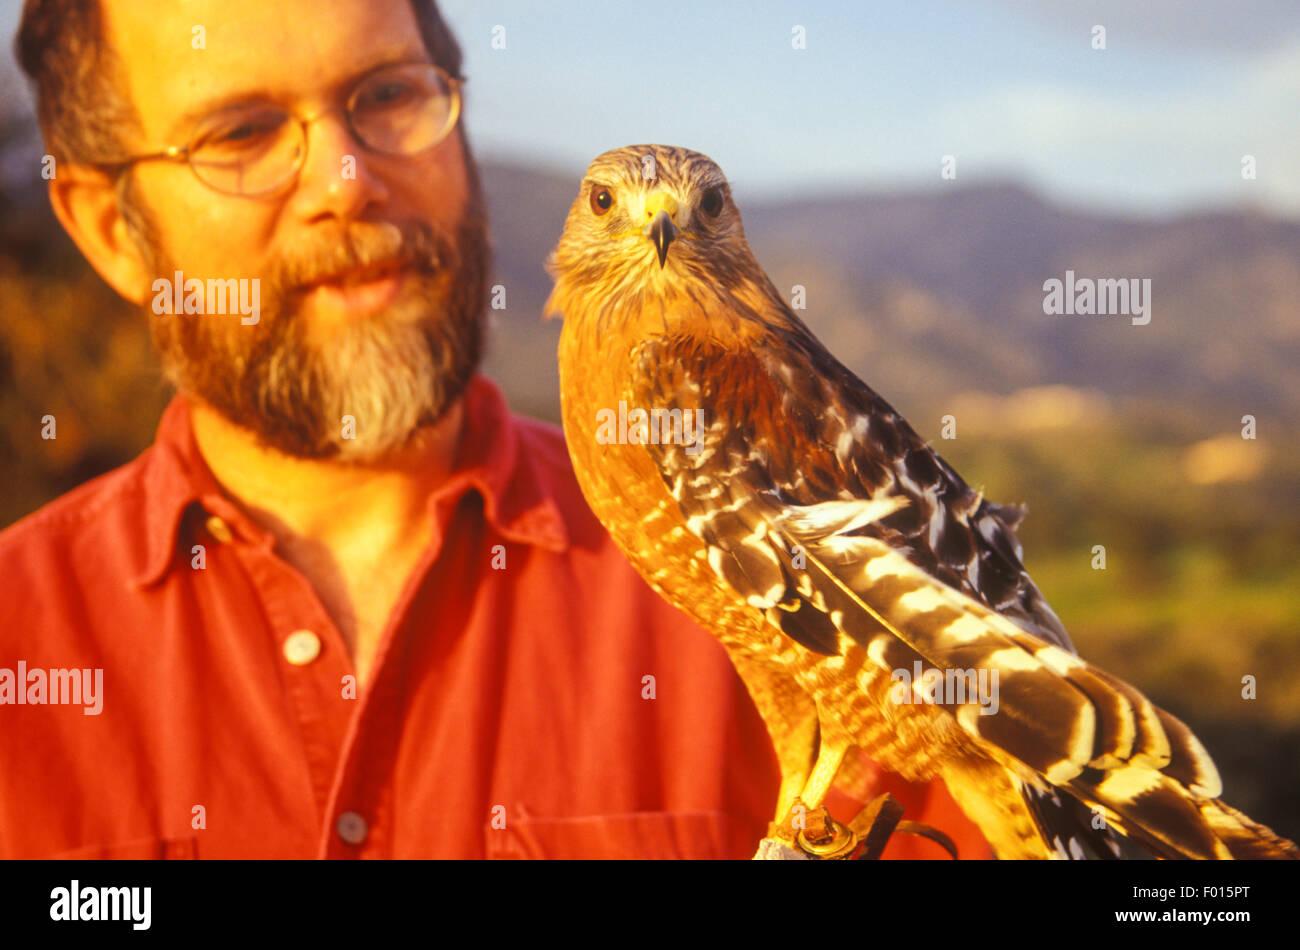 crippled red-shouldered hawk, Buteo lineatus, Santa Barbara Wildlife Care Network, Santa Barbara, California - Stock Image